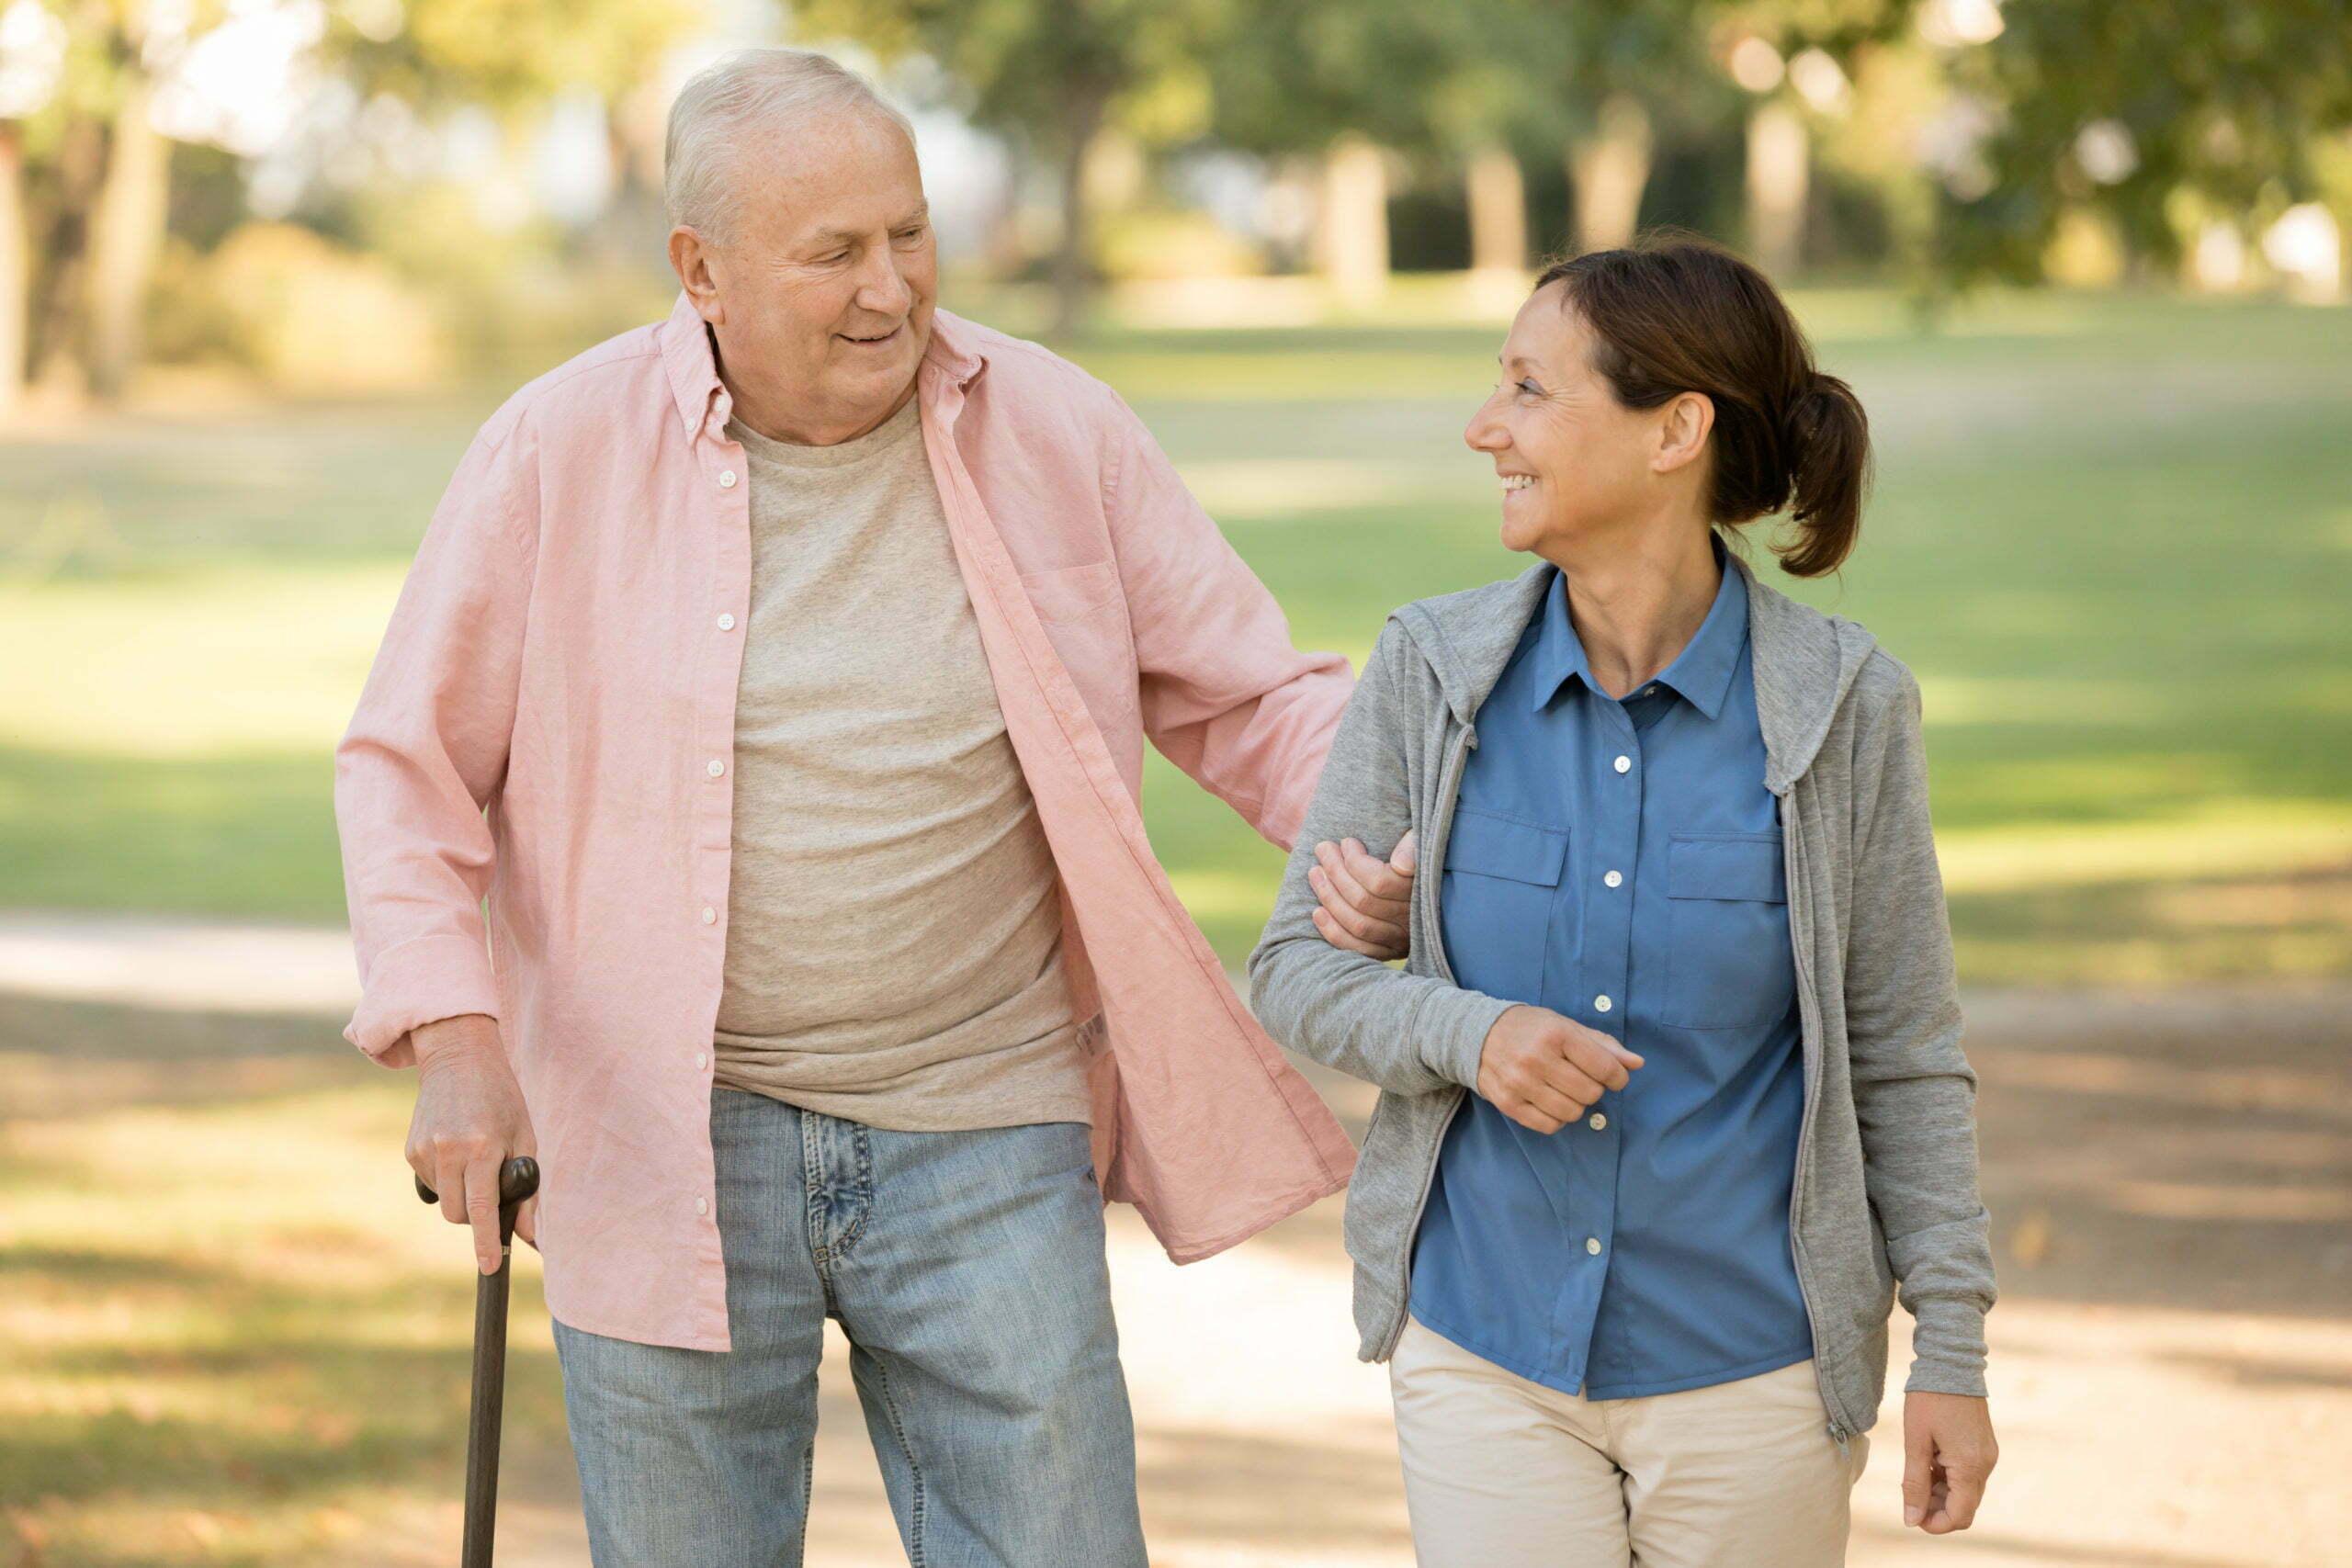 senior resident and caregiver go walking outdoors